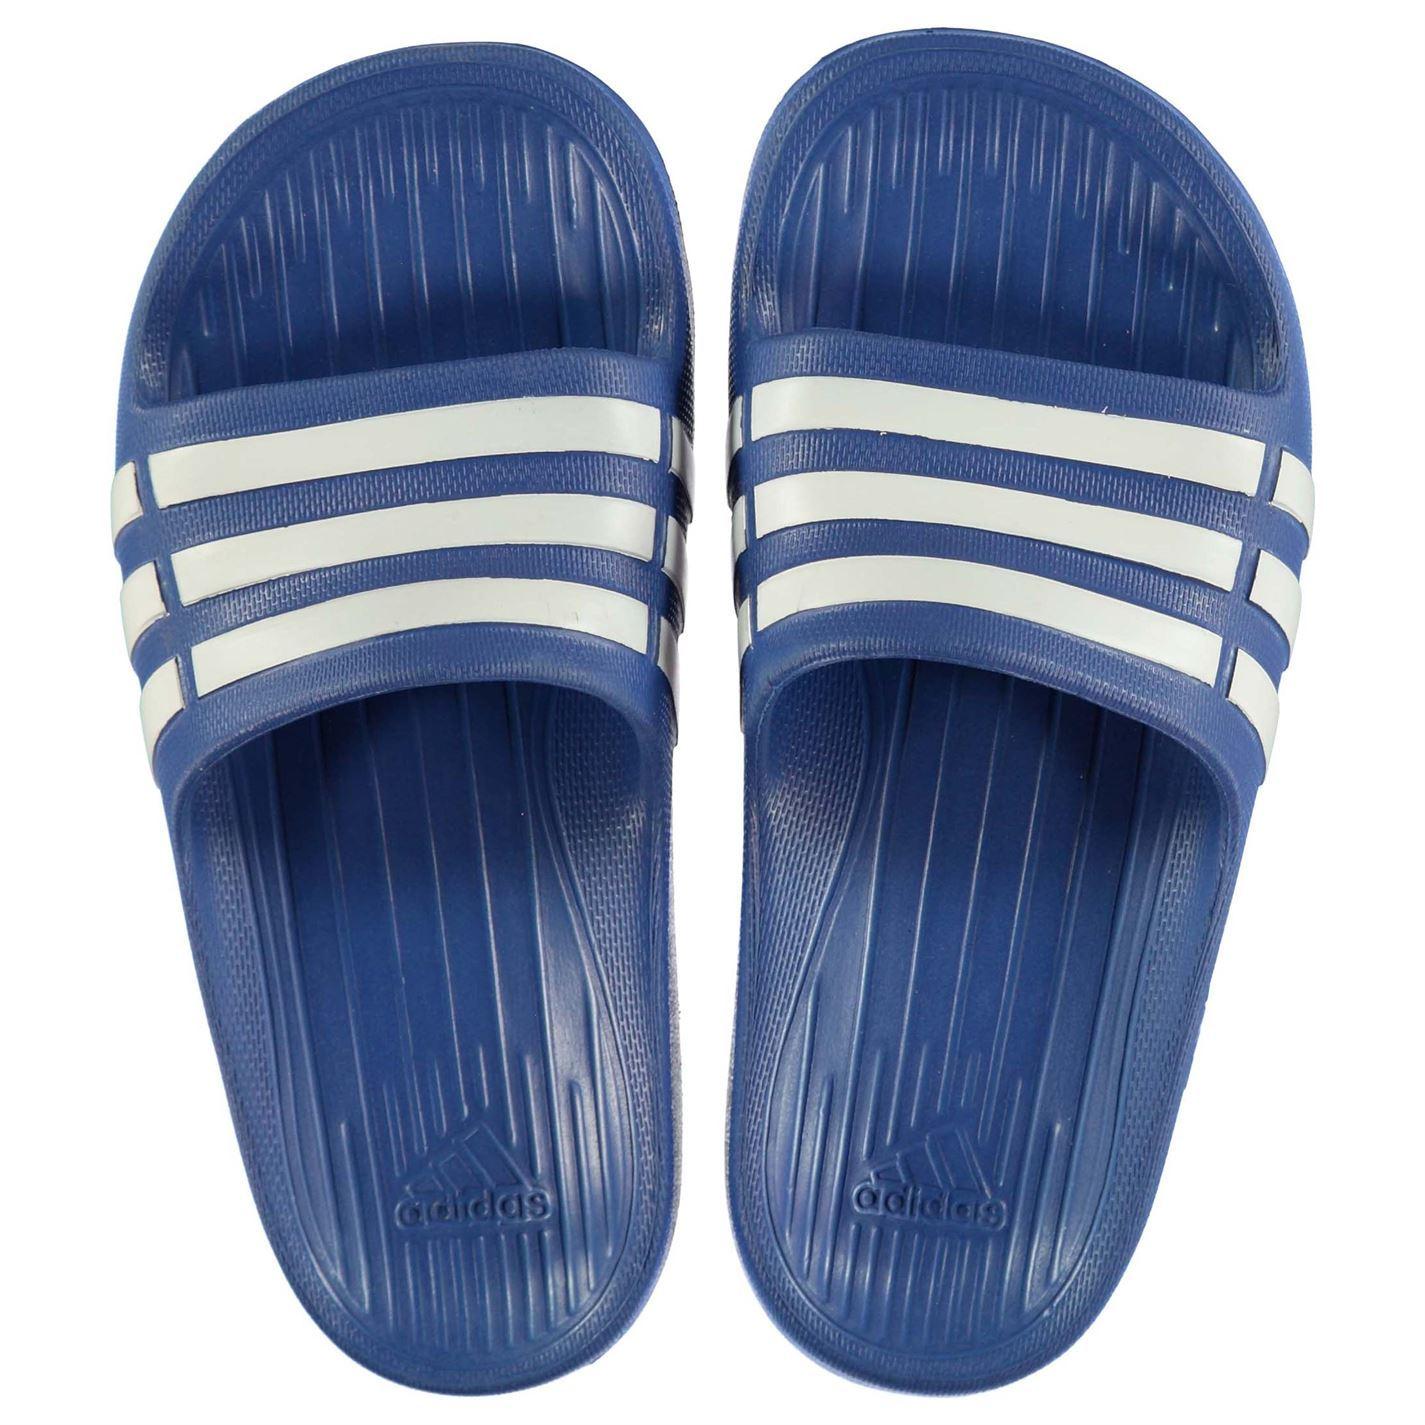 miniatura 11 - ADIDAS-Duramo-Slide-Piscina-Scarpe-Bambino-Ragazzo-Sandali-Infradito-Spiaggia-Scarpe-Thongs